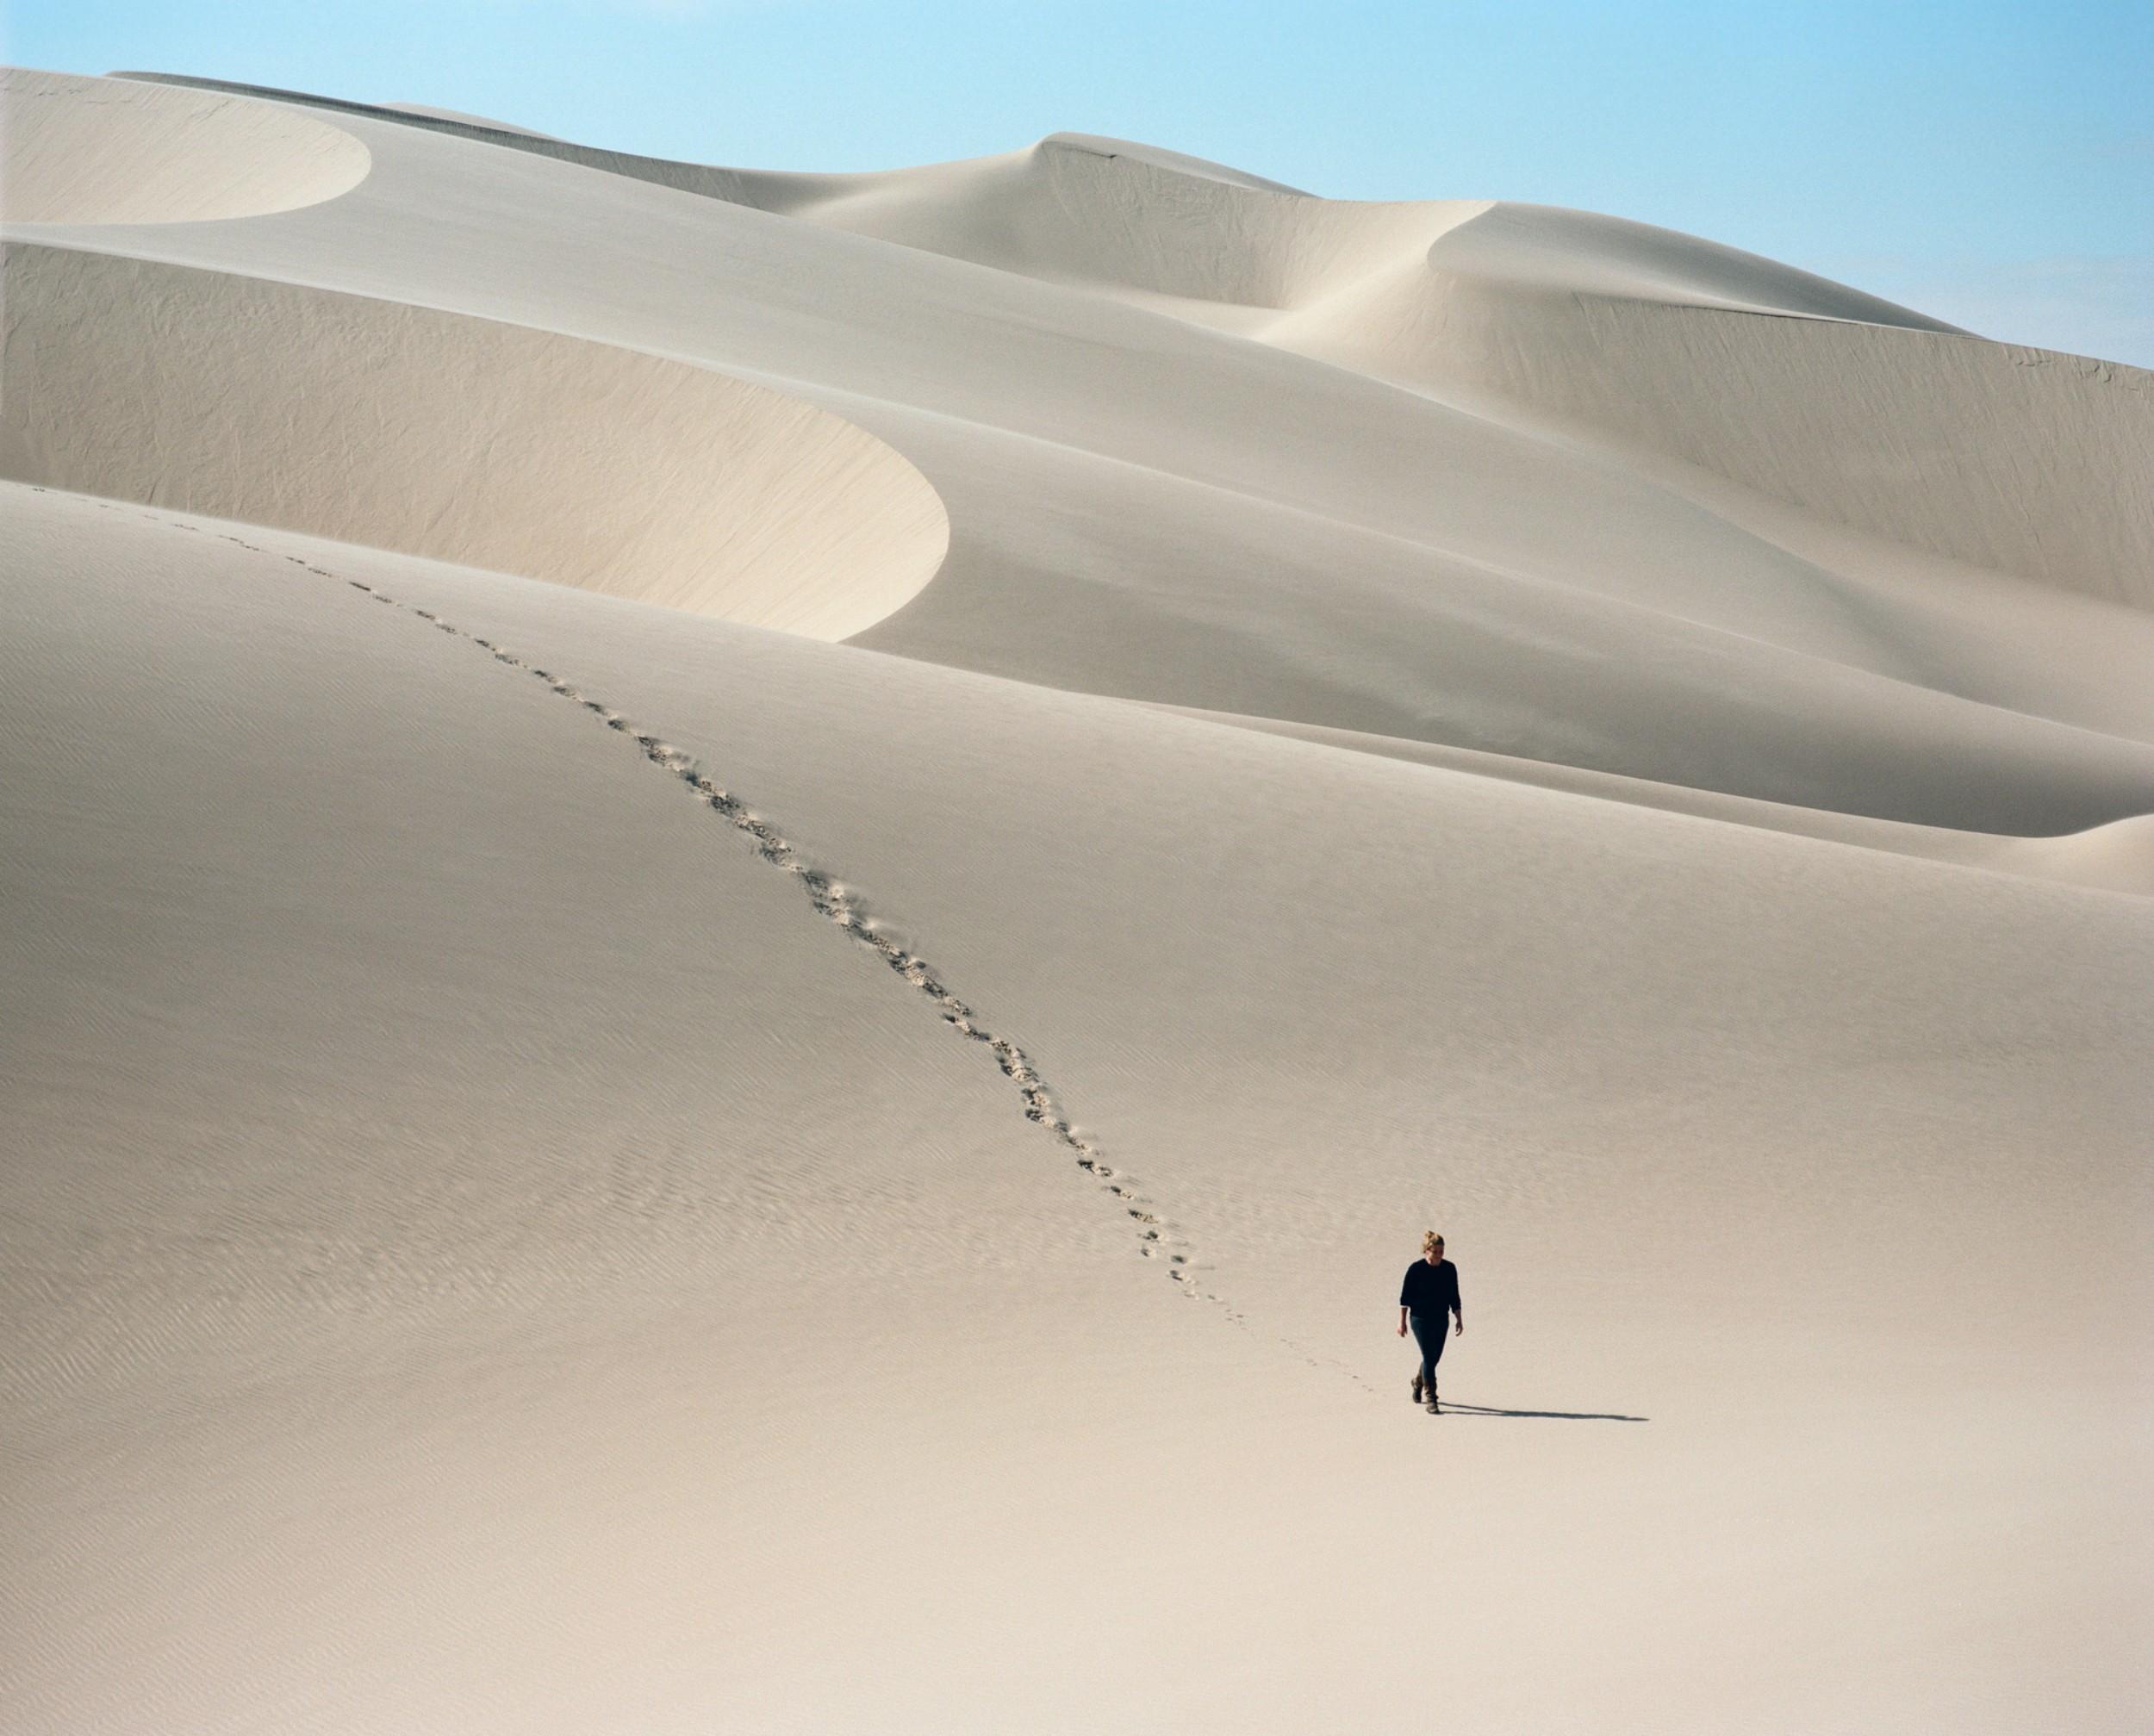 22Shipwreck Lodge - Activities - Dune exploring14.jpg